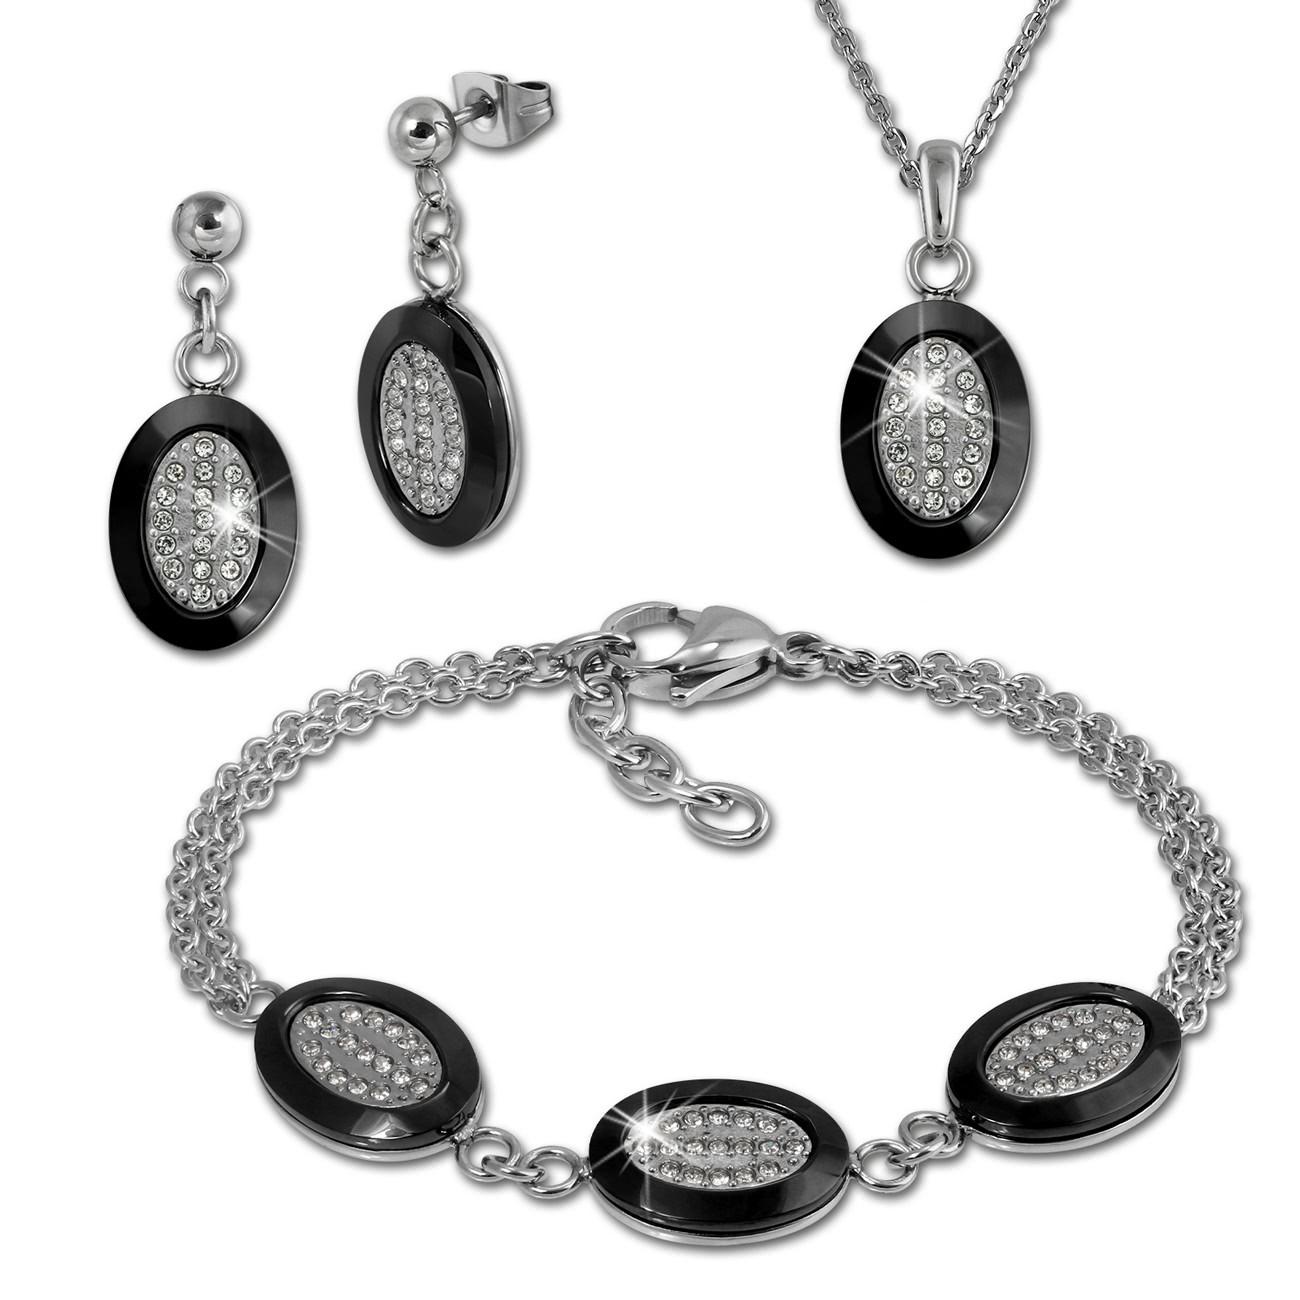 Amello Edelstahlschmuckset Keramik Rund Zirkonia Kette, Armband, Ohrring ESSX32S